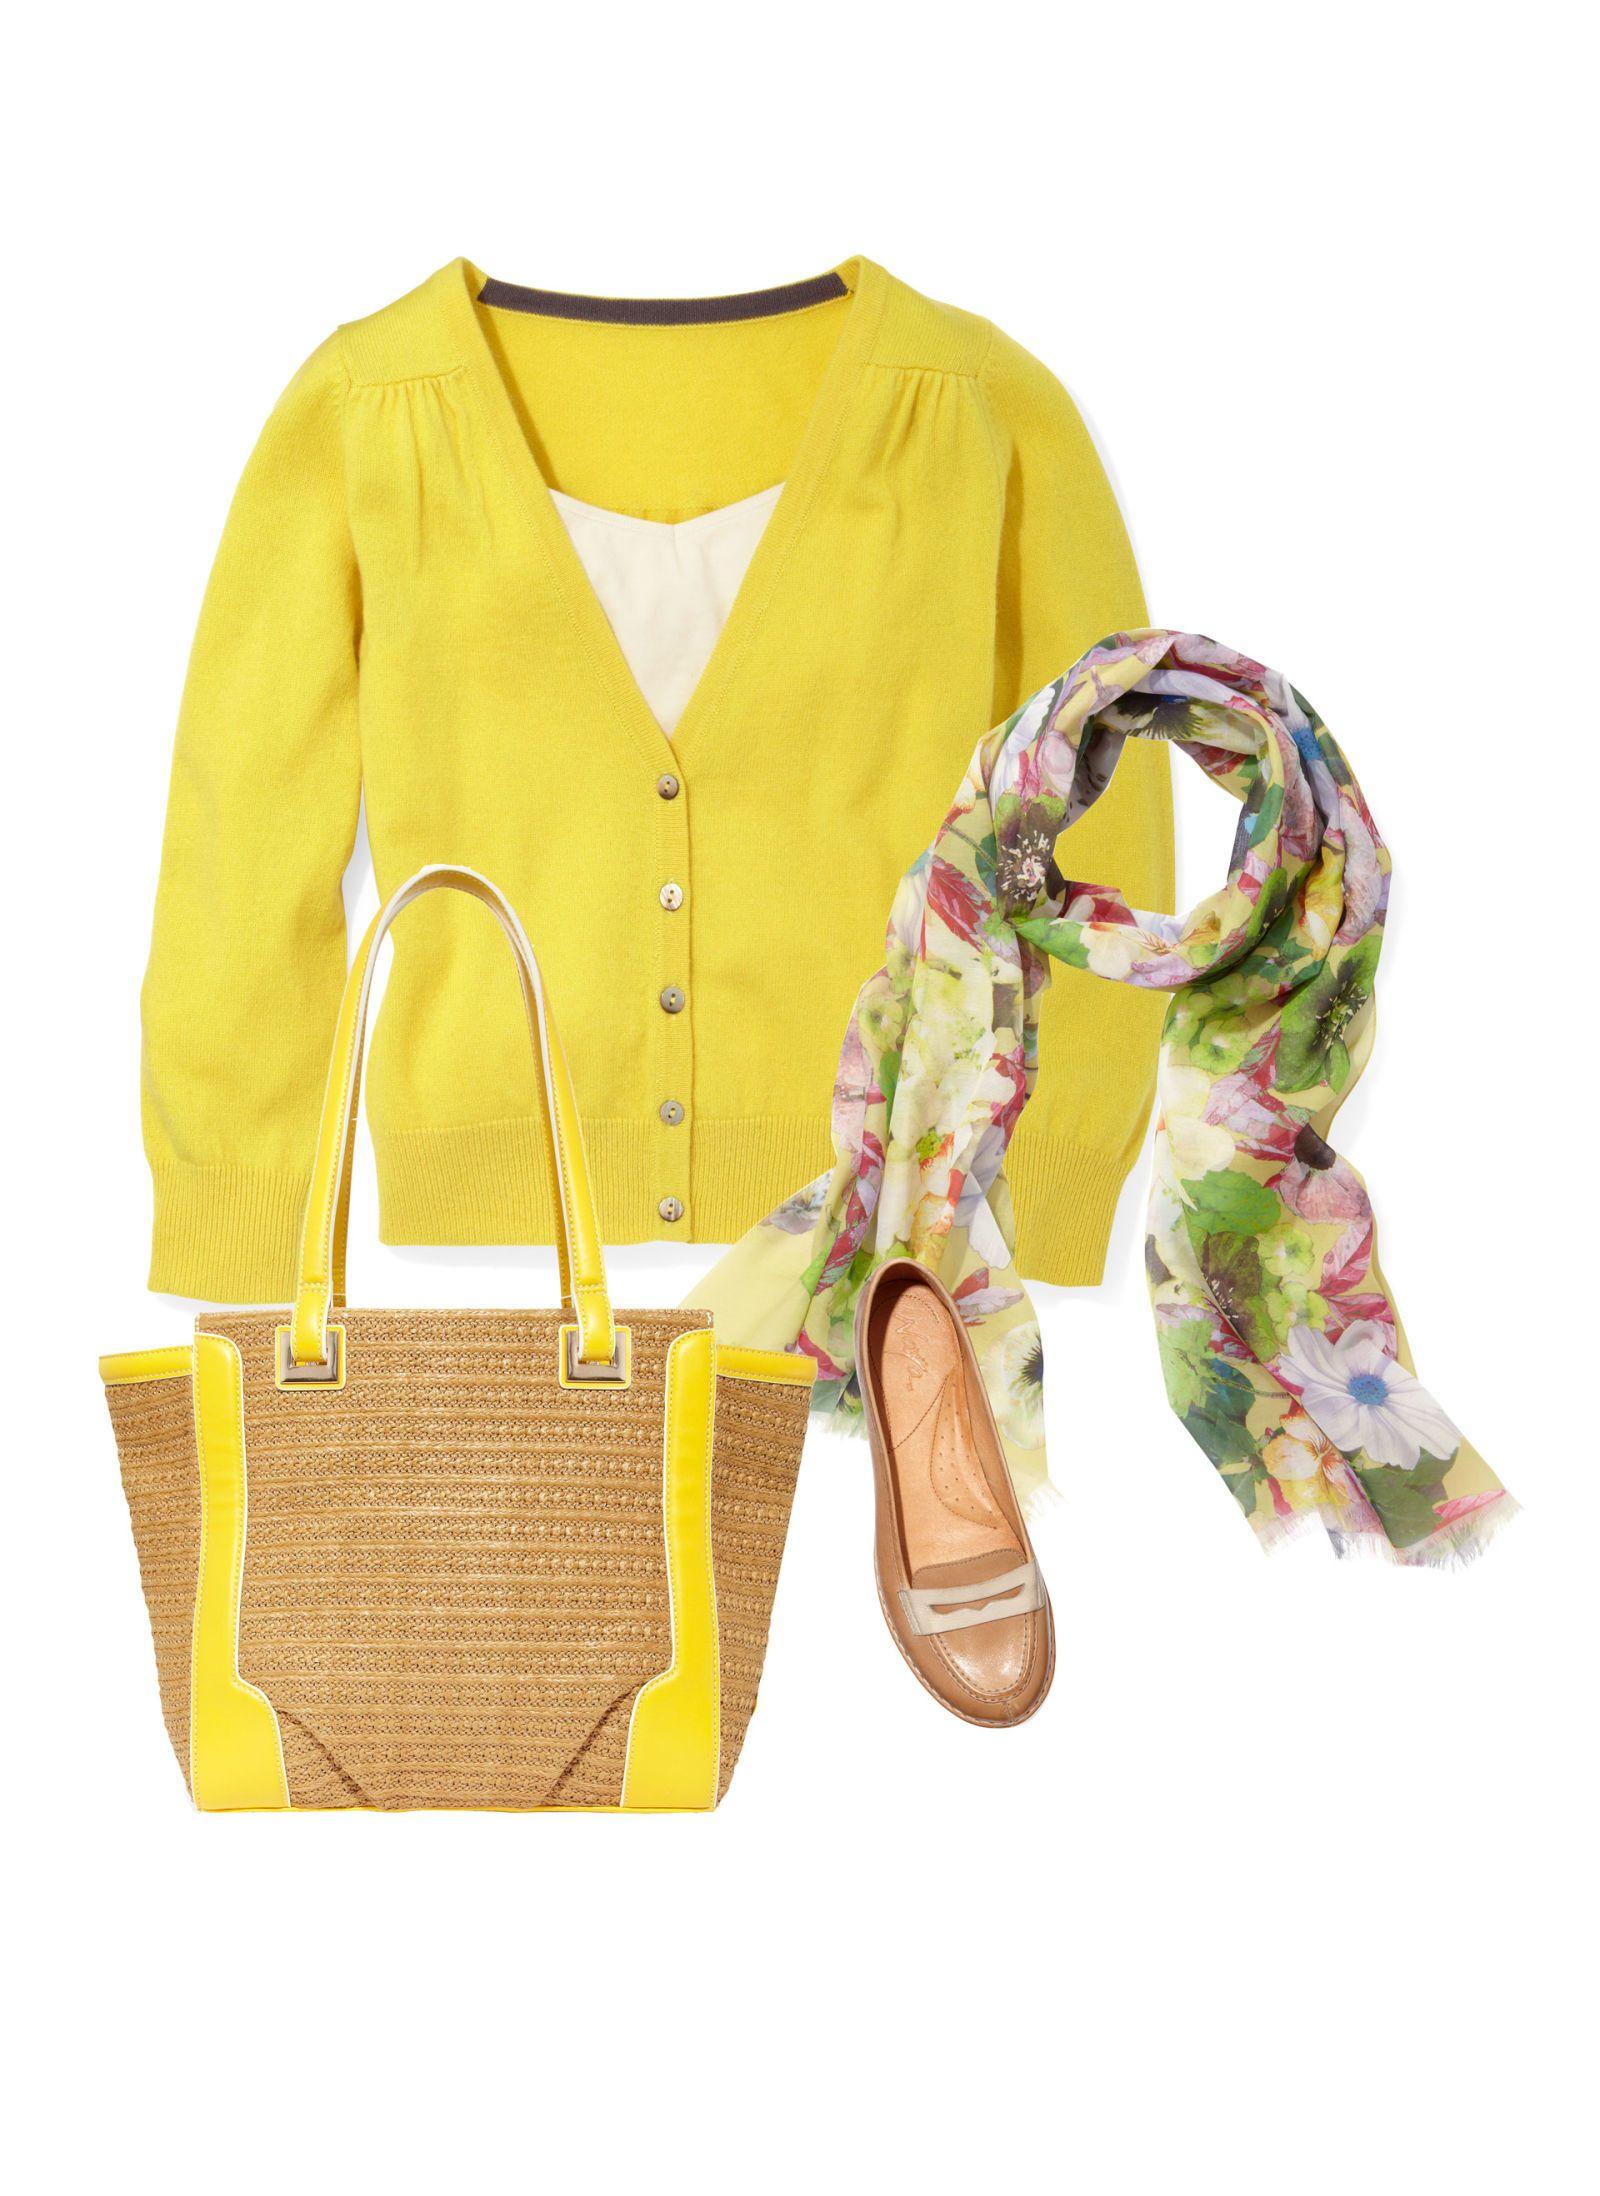 boden yellow cardigan